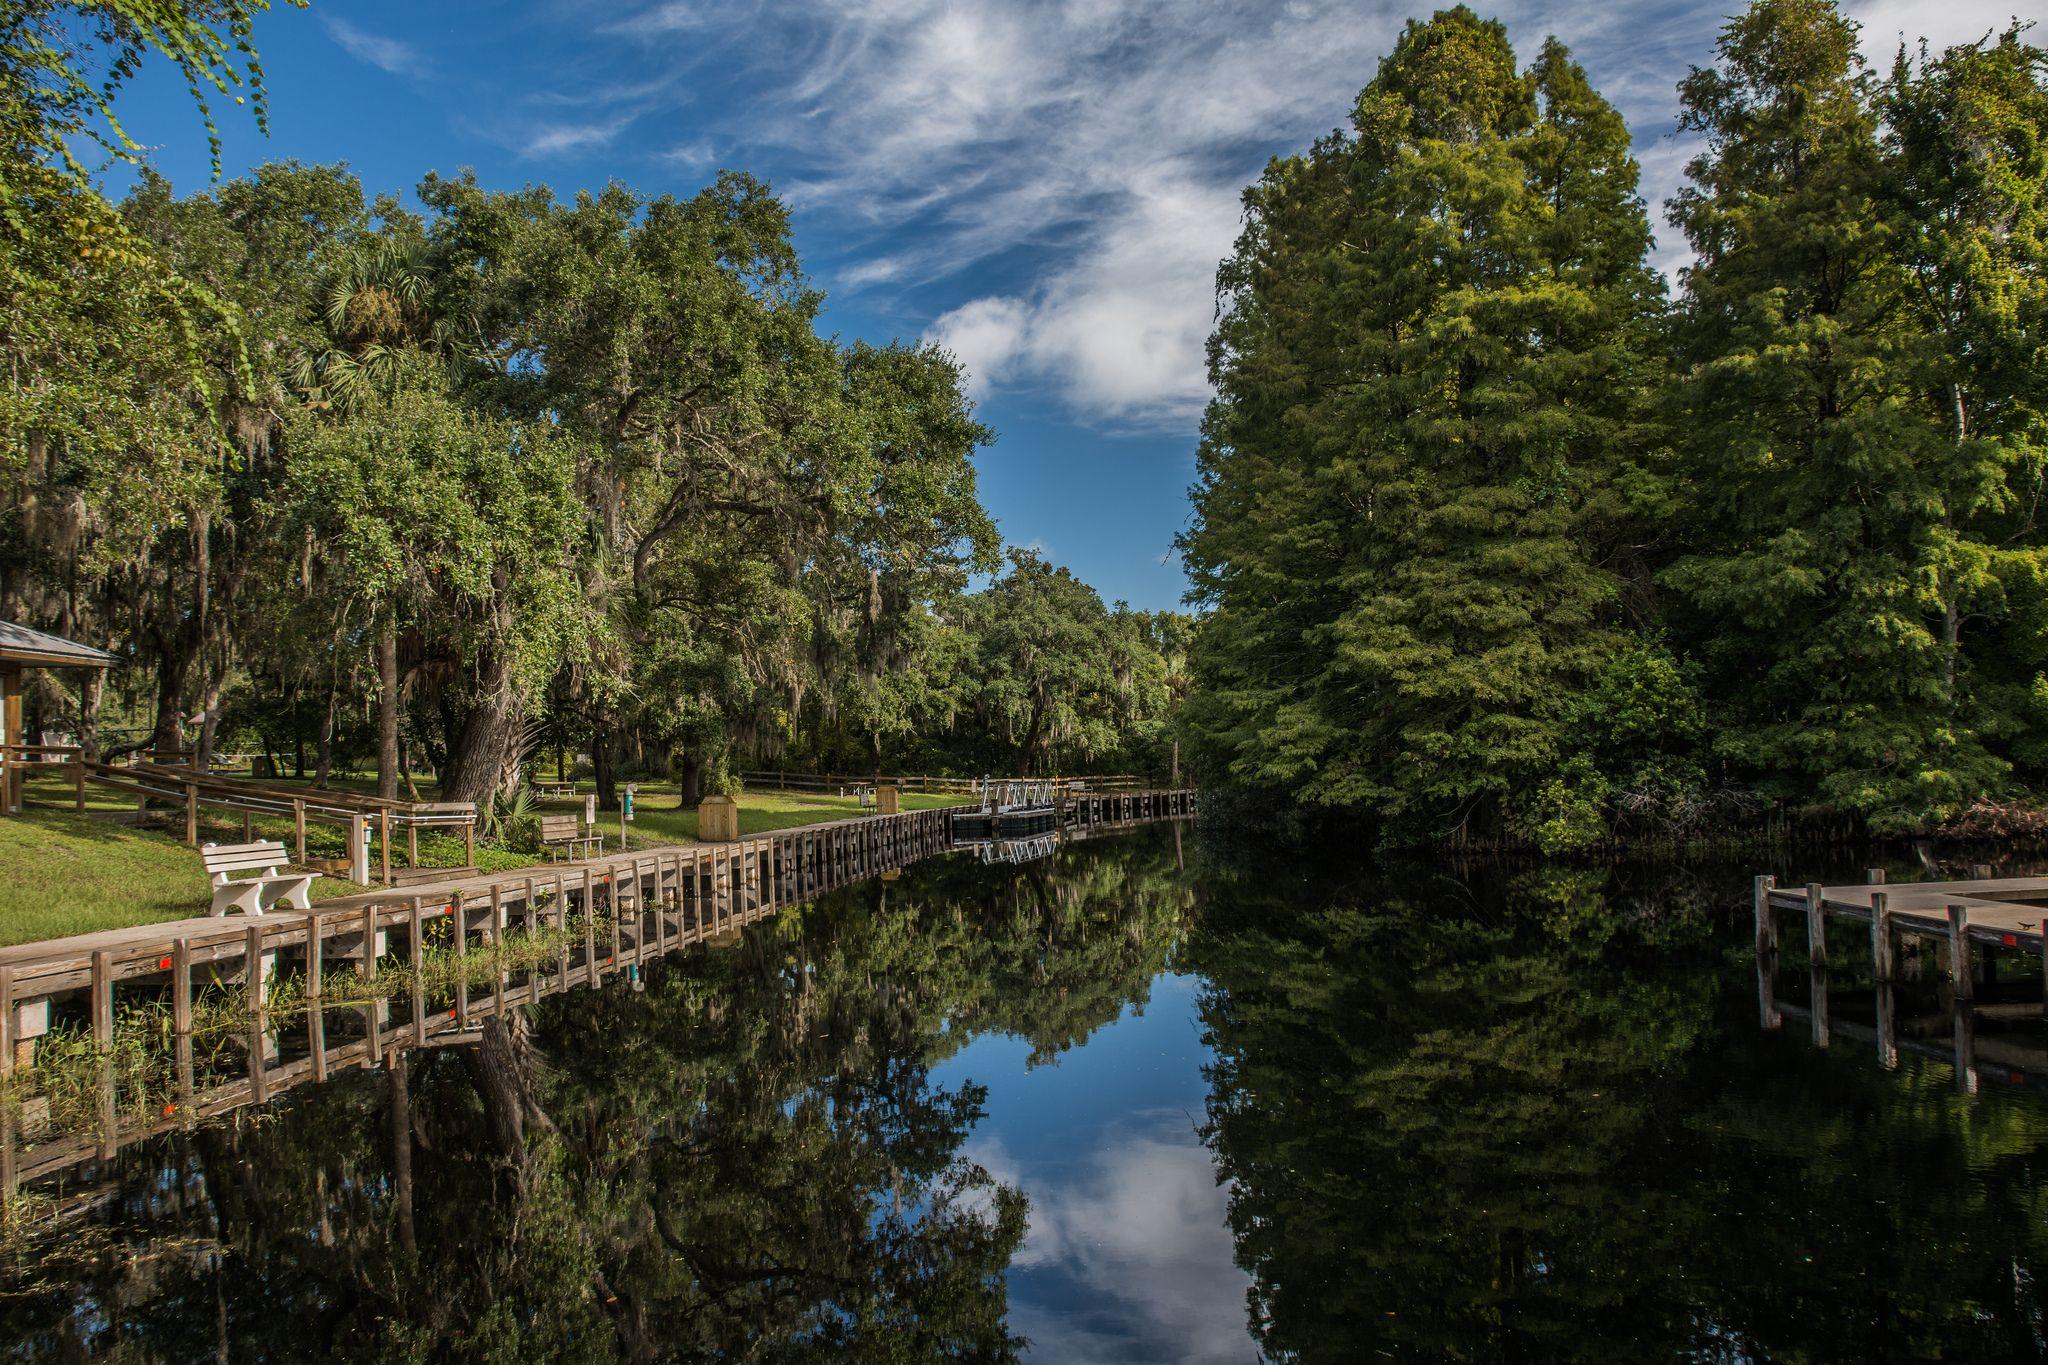 https://flic.kr/p/phmpgE | Lake Griffin State Park- Fruitland, Florida